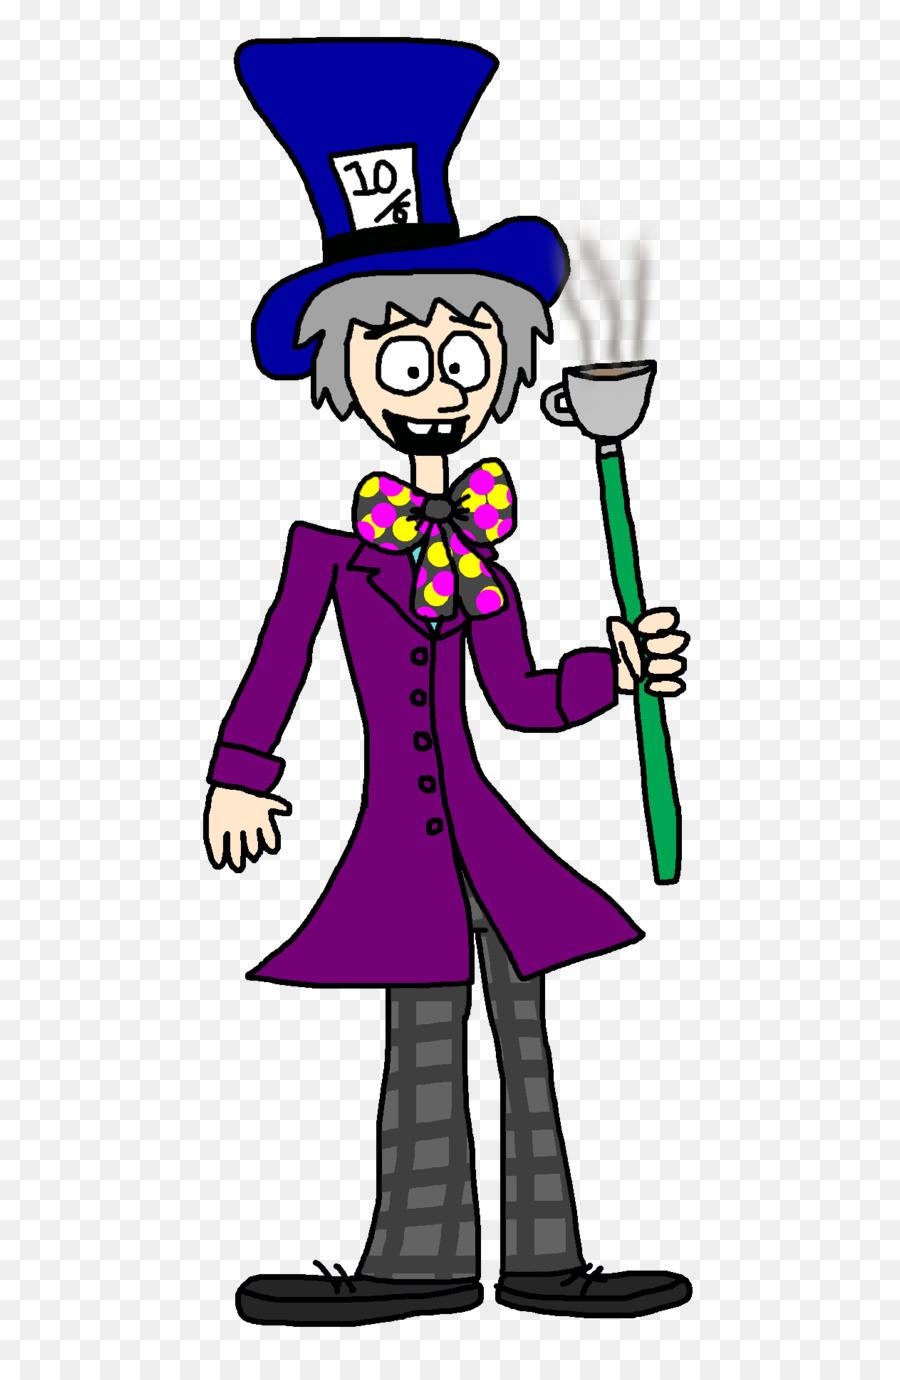 Joker Kartun Perilaku Manusia Clip Art Mad Hatter Unduh Perilaku